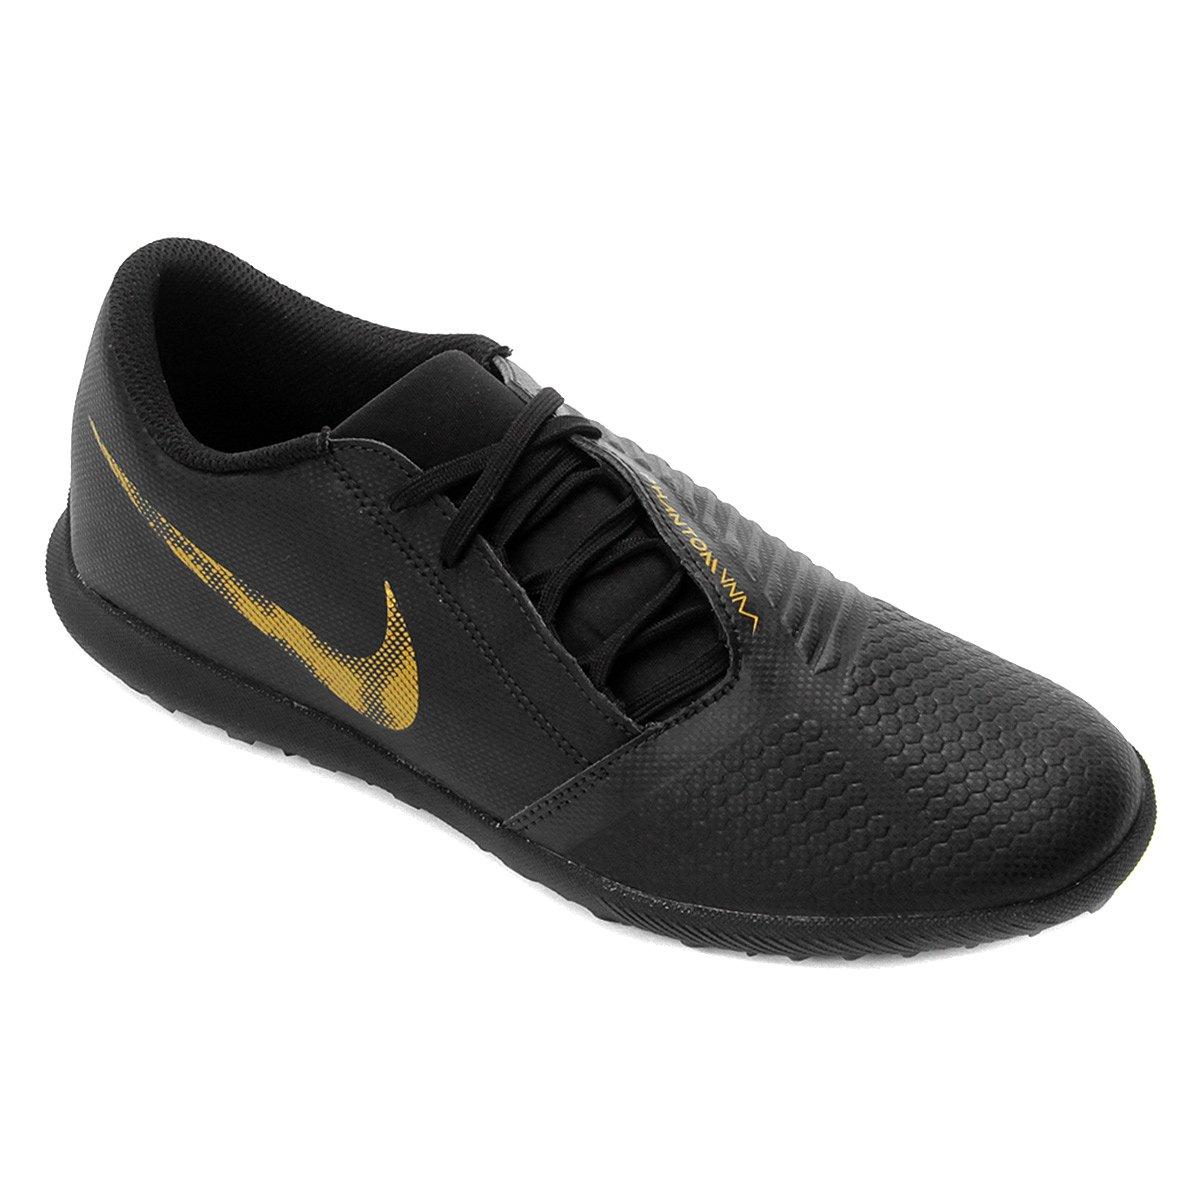 Chuteira Society Nike Phantom Venom Club TF - Preto e Dourado ... f9ba94a410a82